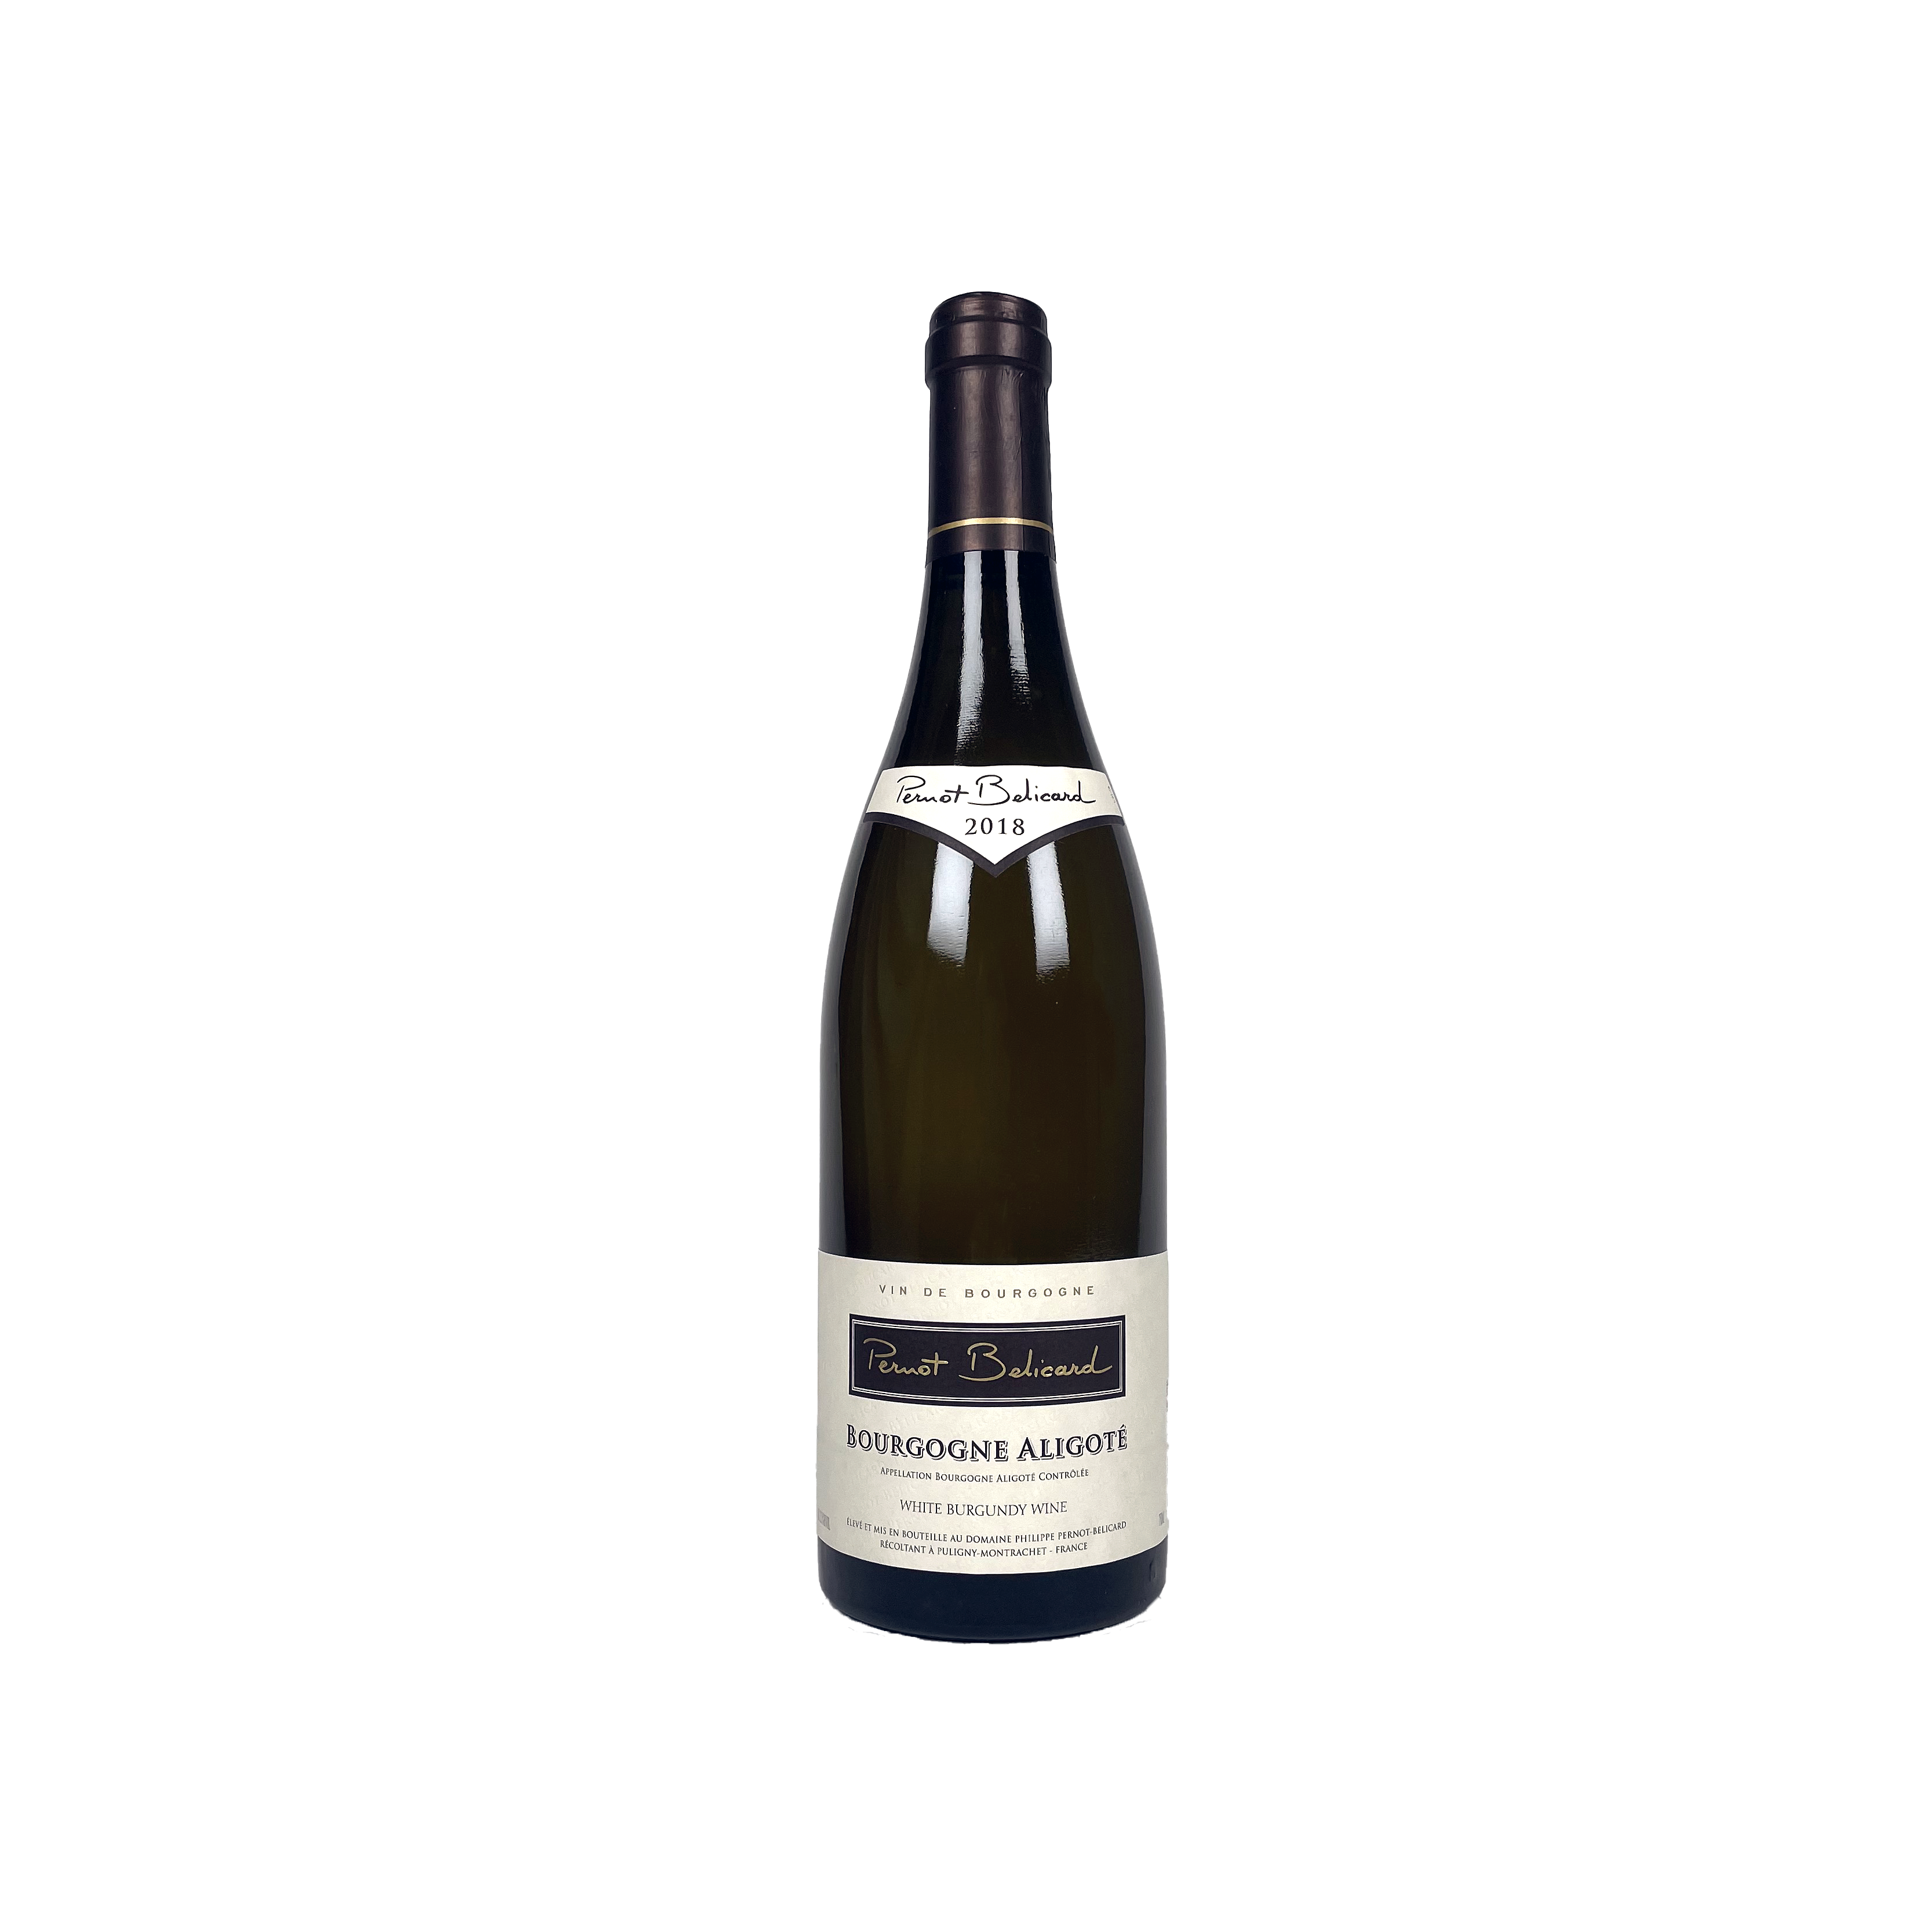 Pernot Belicard Bourgogne Aligote, 2018, 75CL